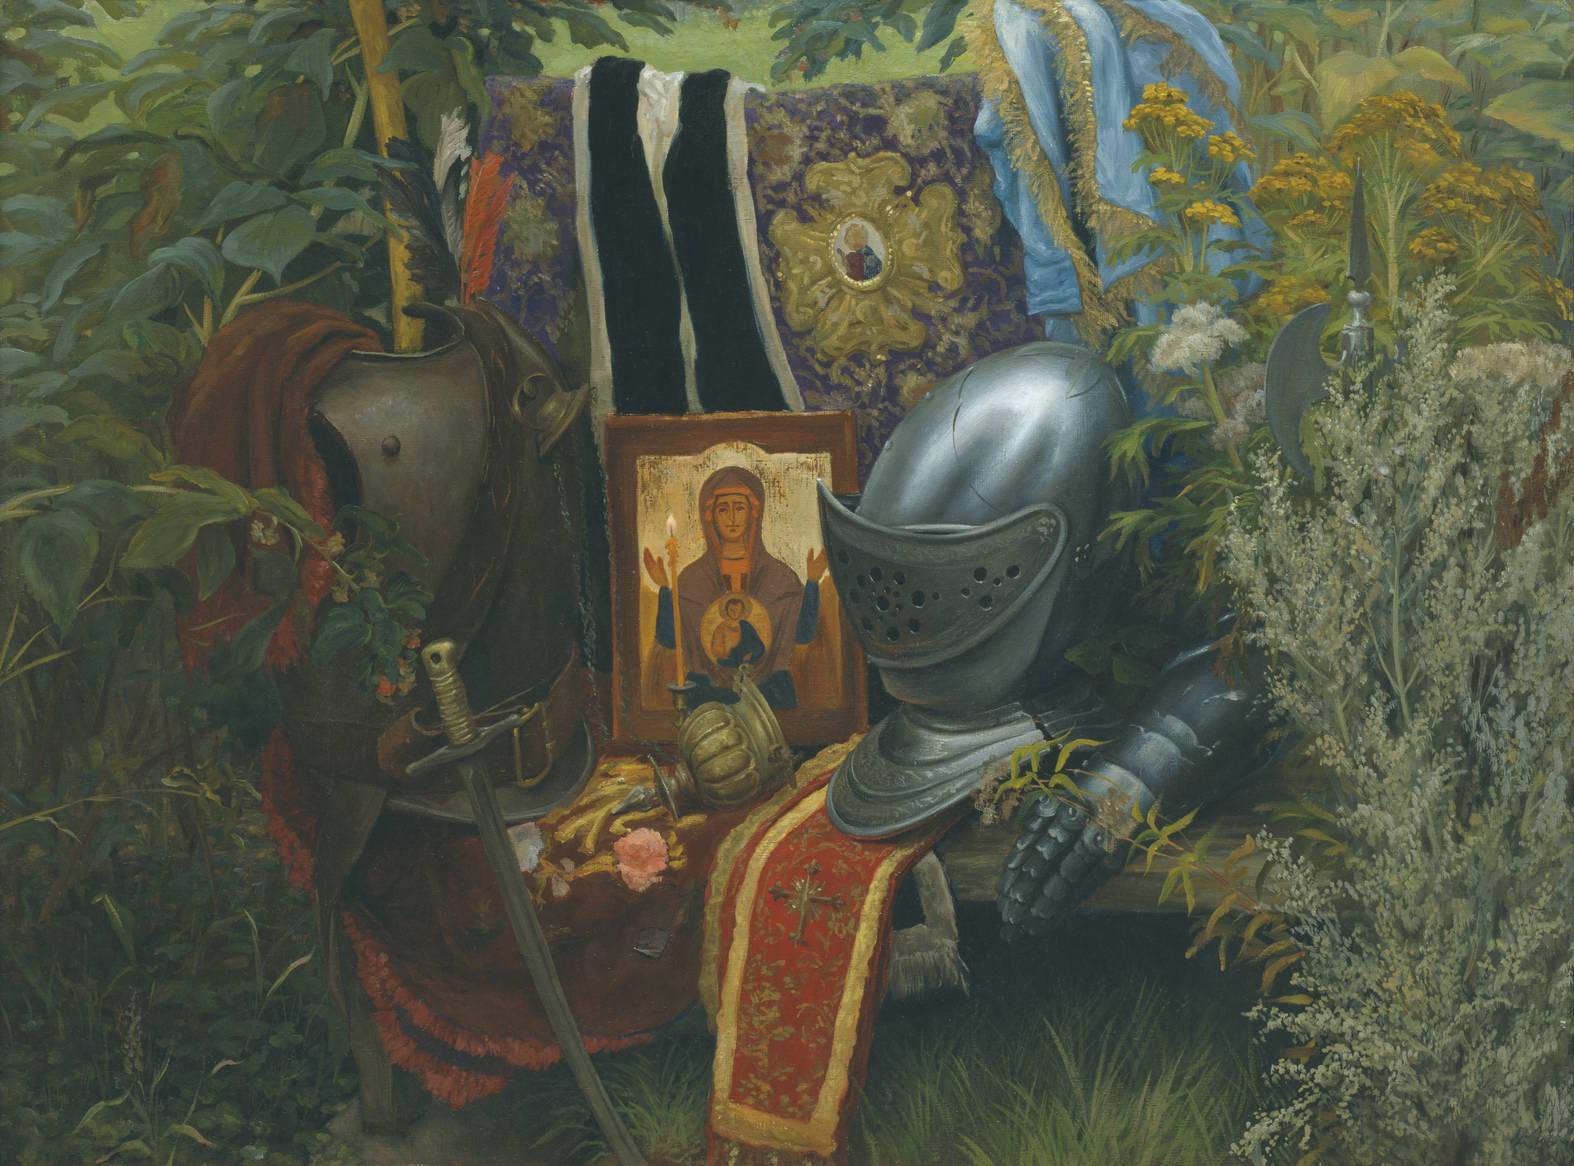 """Натюрморт со шлемом"" - х.м. (91х122) - 1985 г"